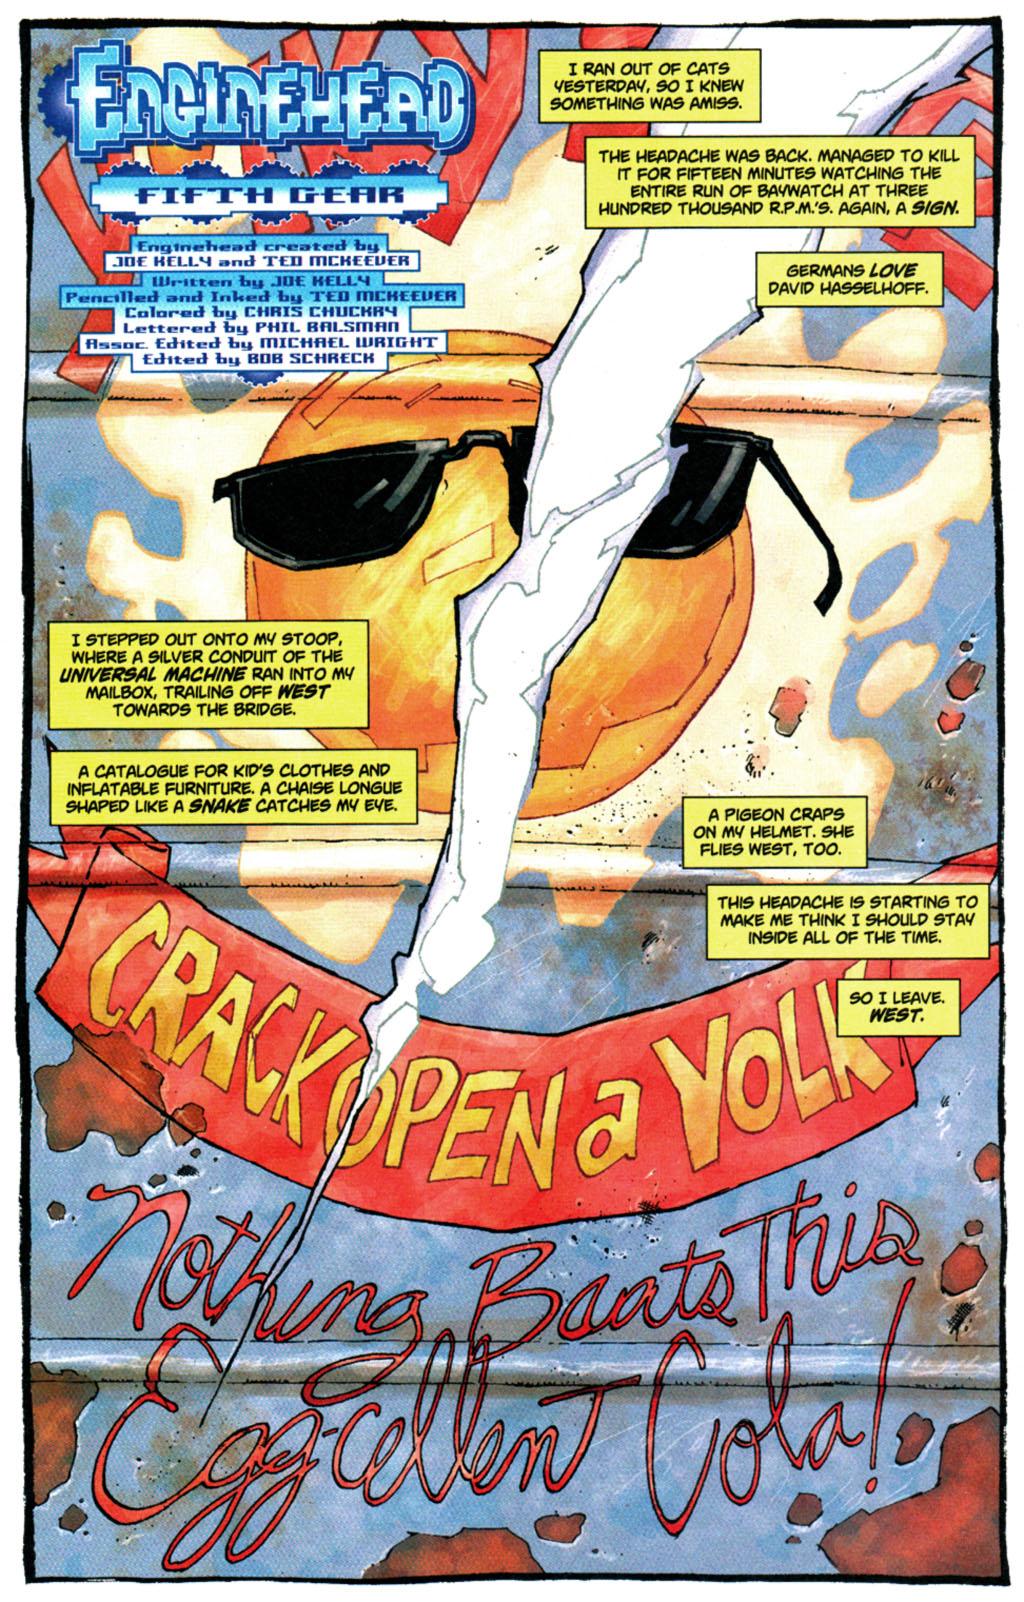 Read online Enginehead comic -  Issue #5 - 2